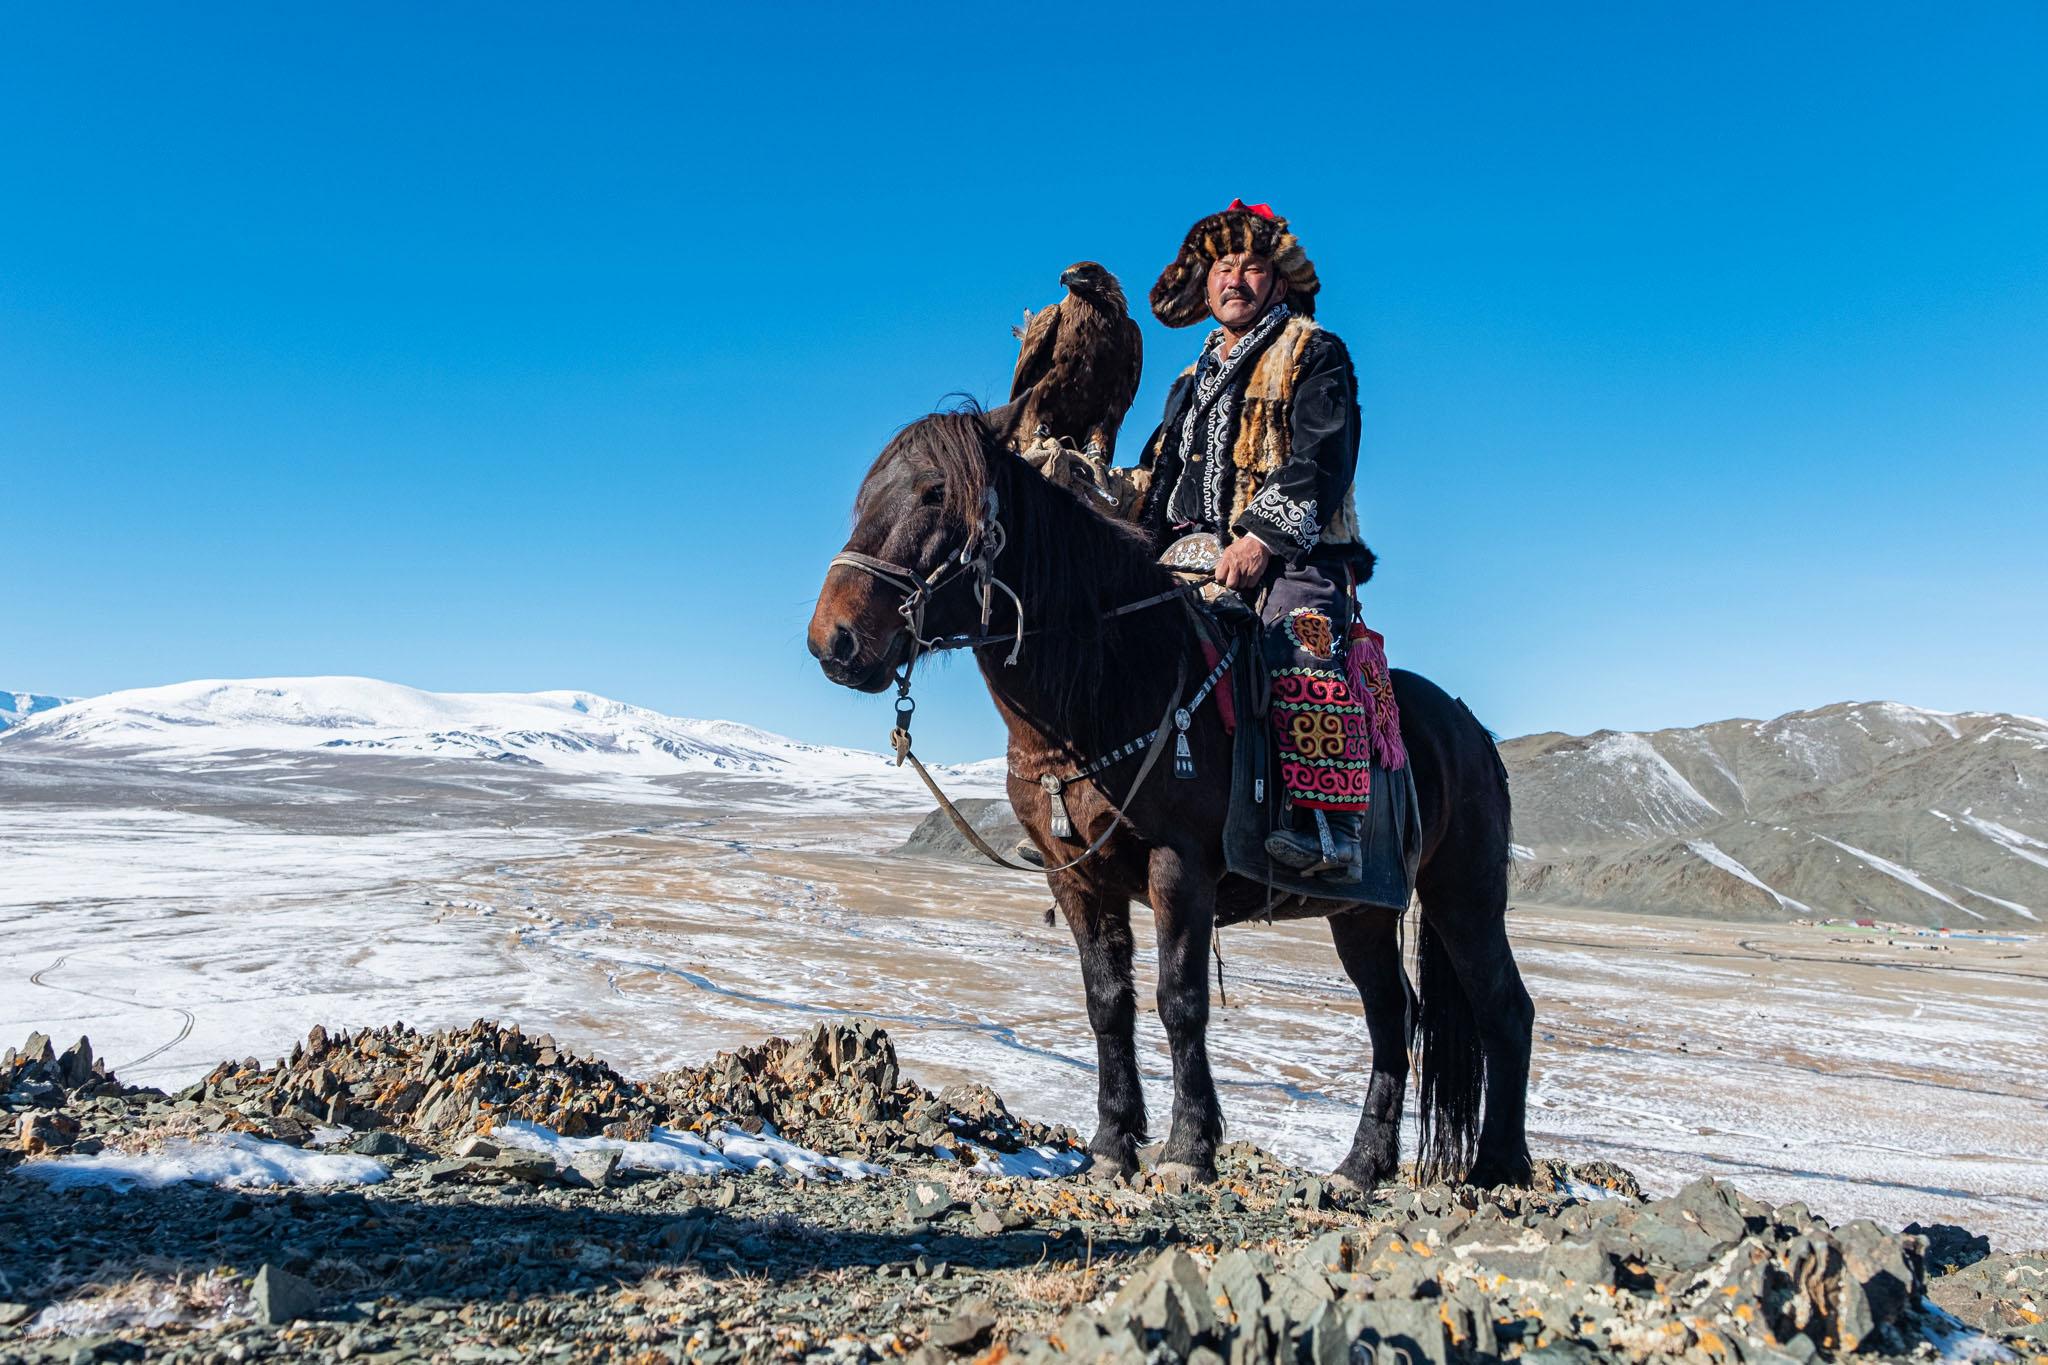 Eagle hunter on mountain